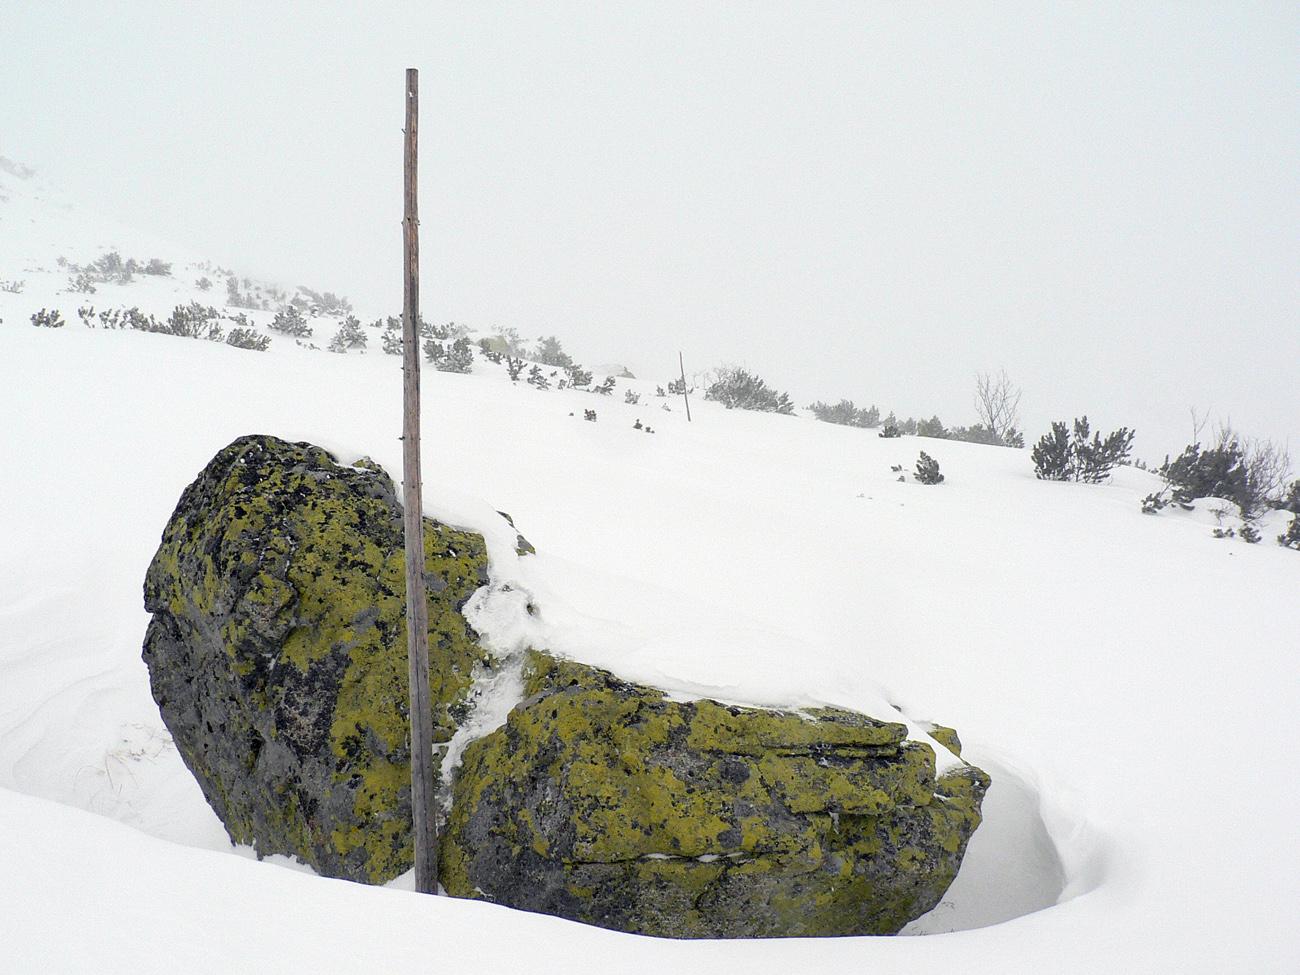 ziarska-dolina-rychly-stefansky-prieskum